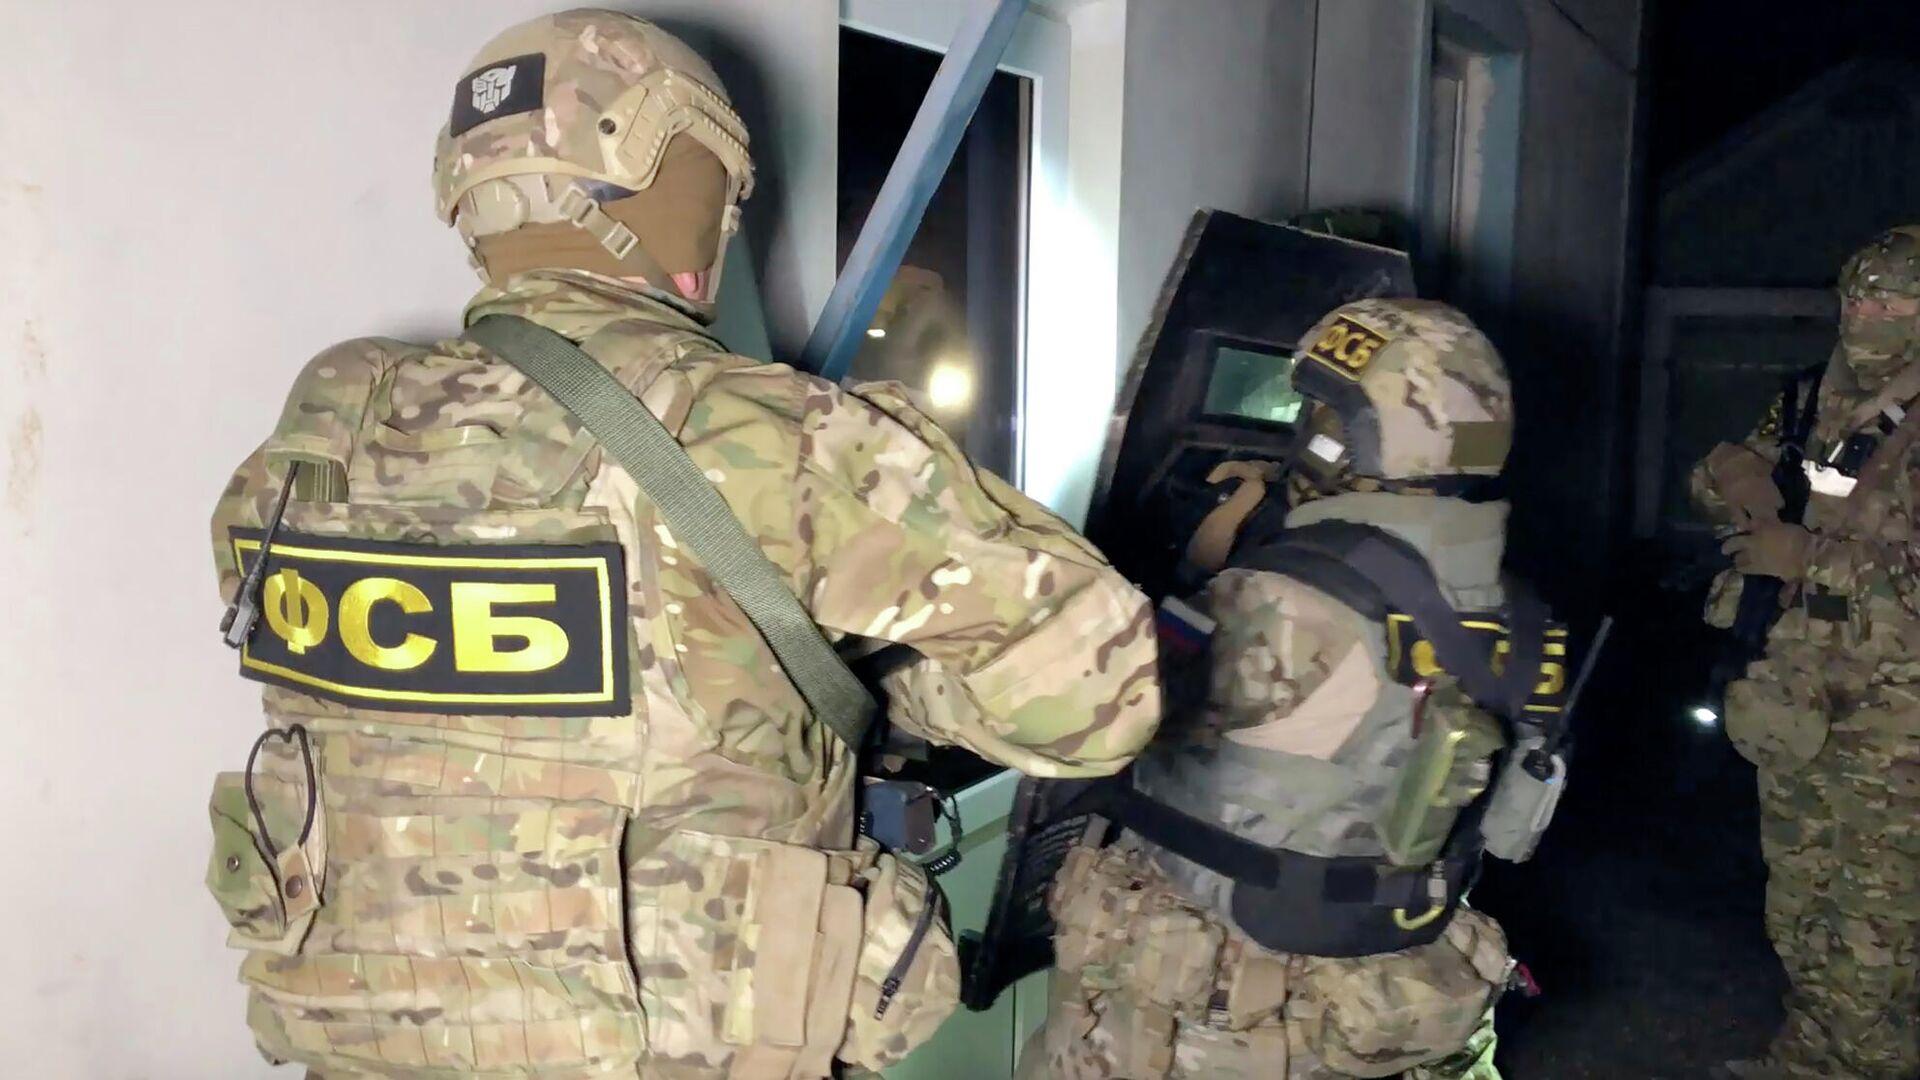 ФСБ предотвратила теракт в Тамбове